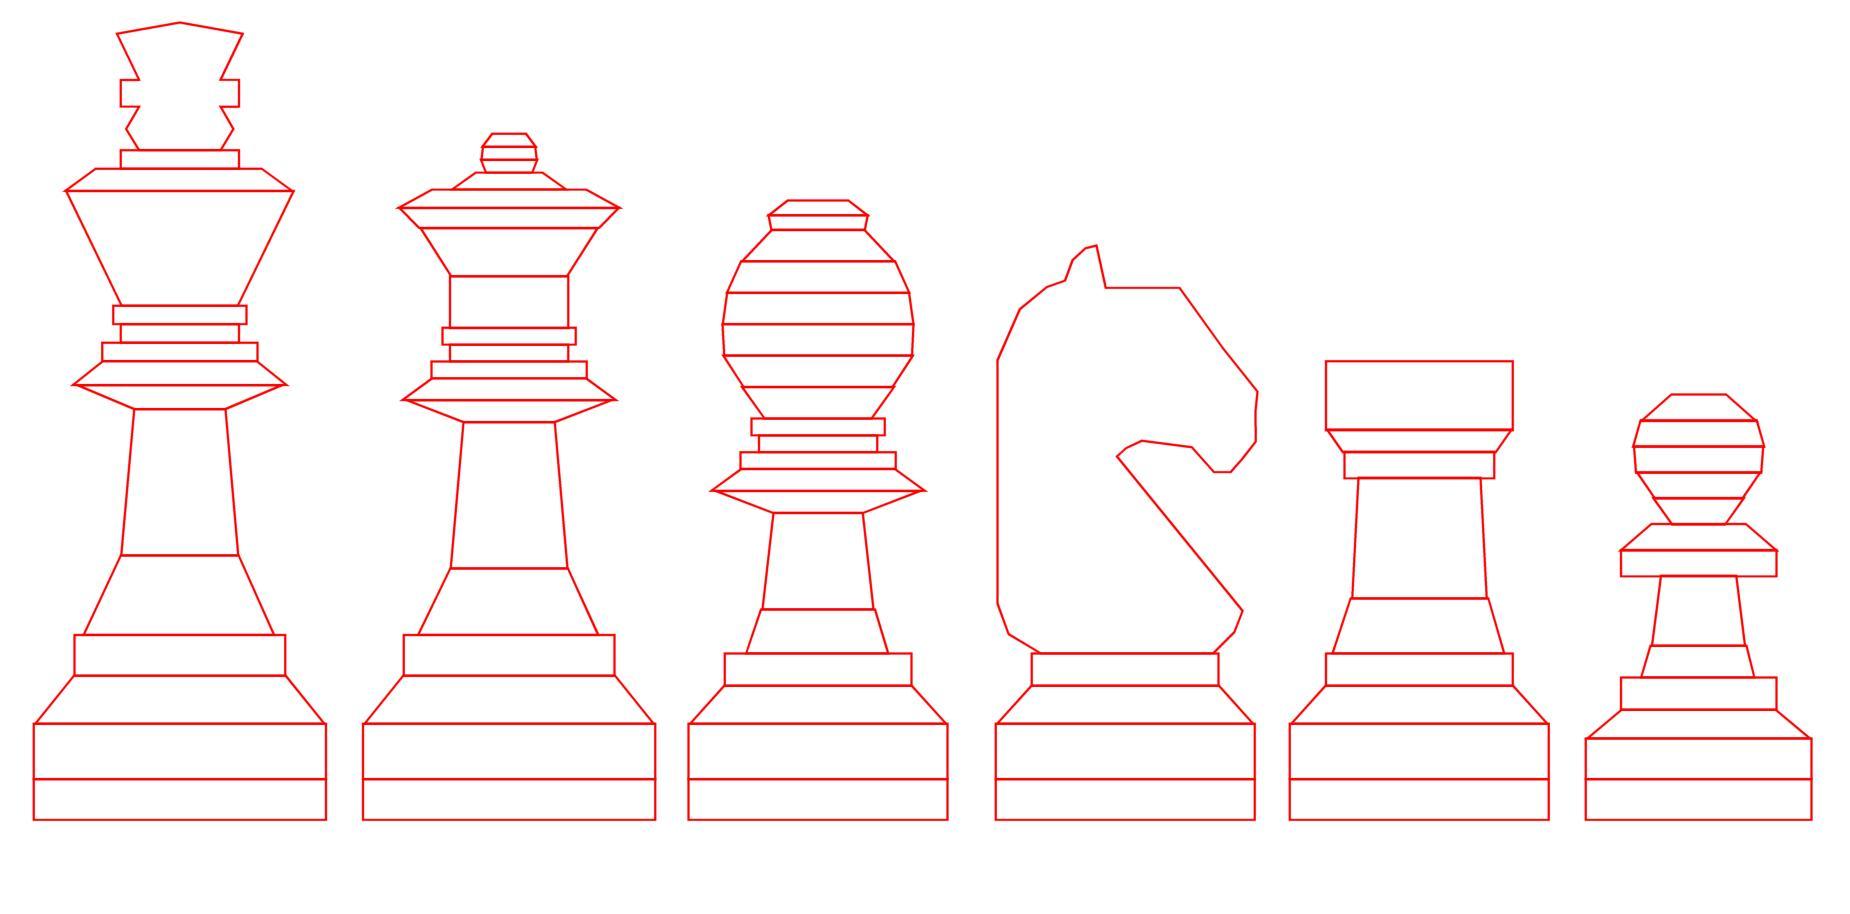 трафареты шахматных фигур фото